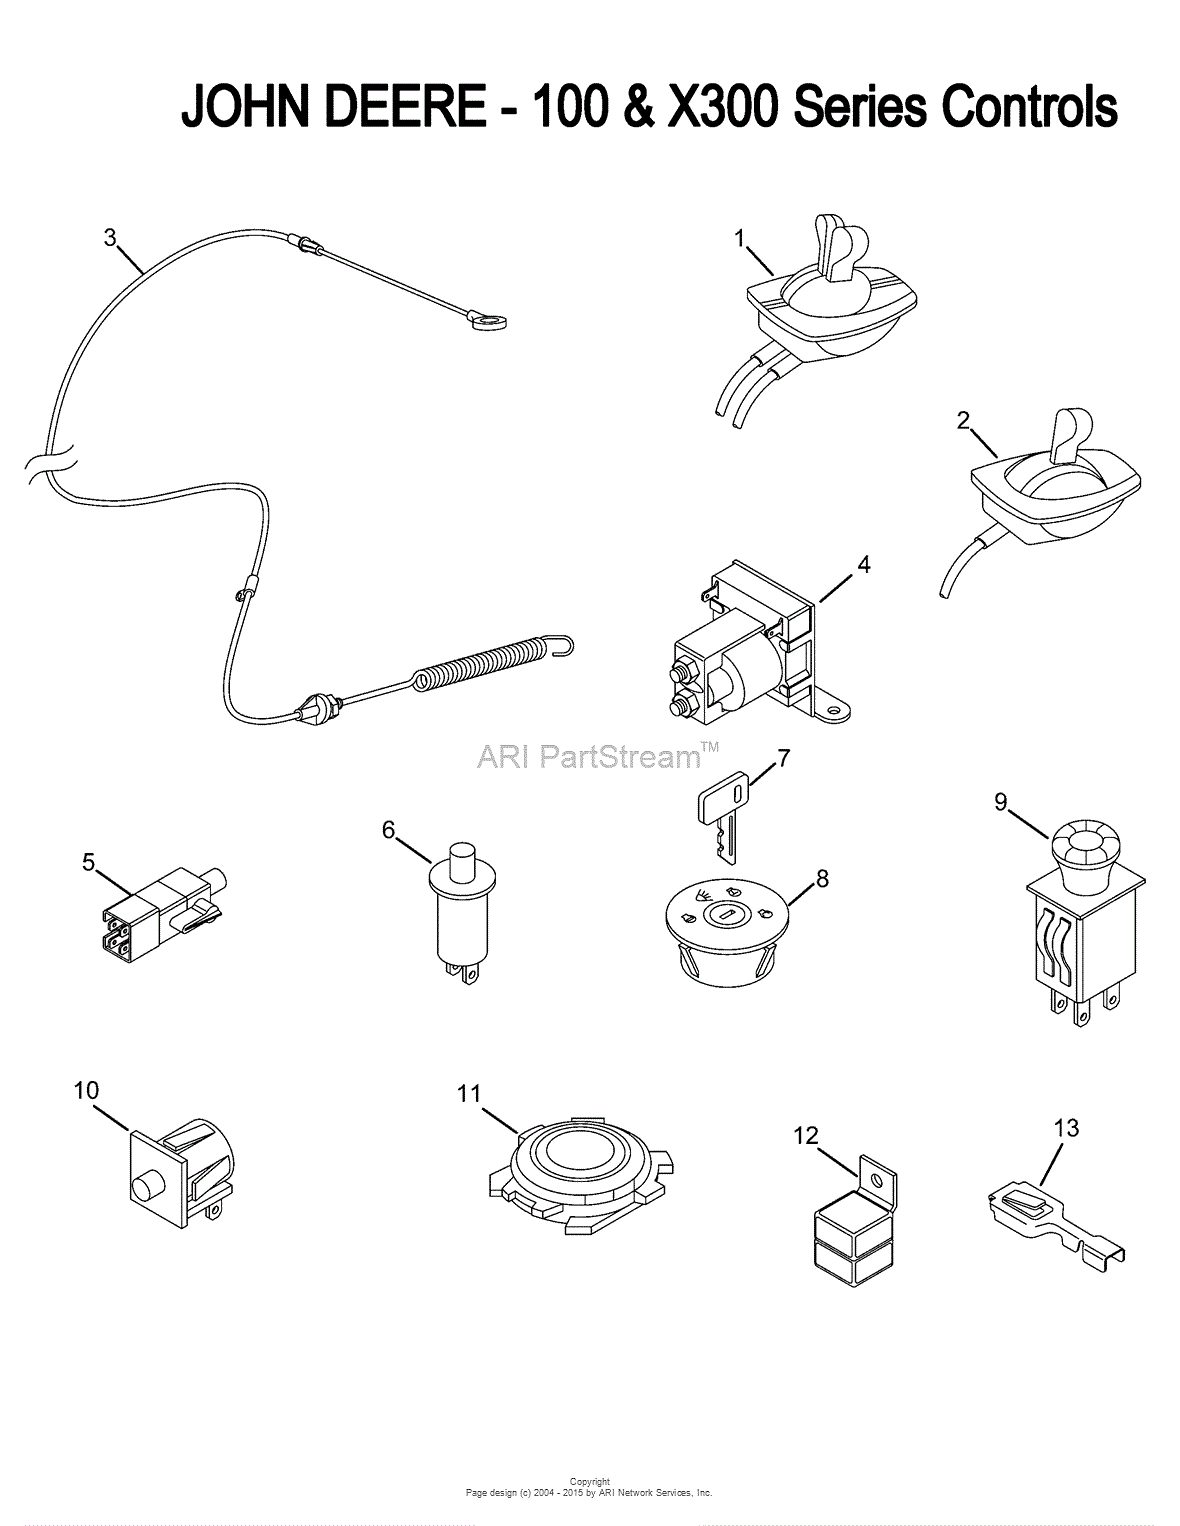 John Deere L100 Wiring Schematic Trusted Schematics Diagram 450c Harness Diagrams Lx176